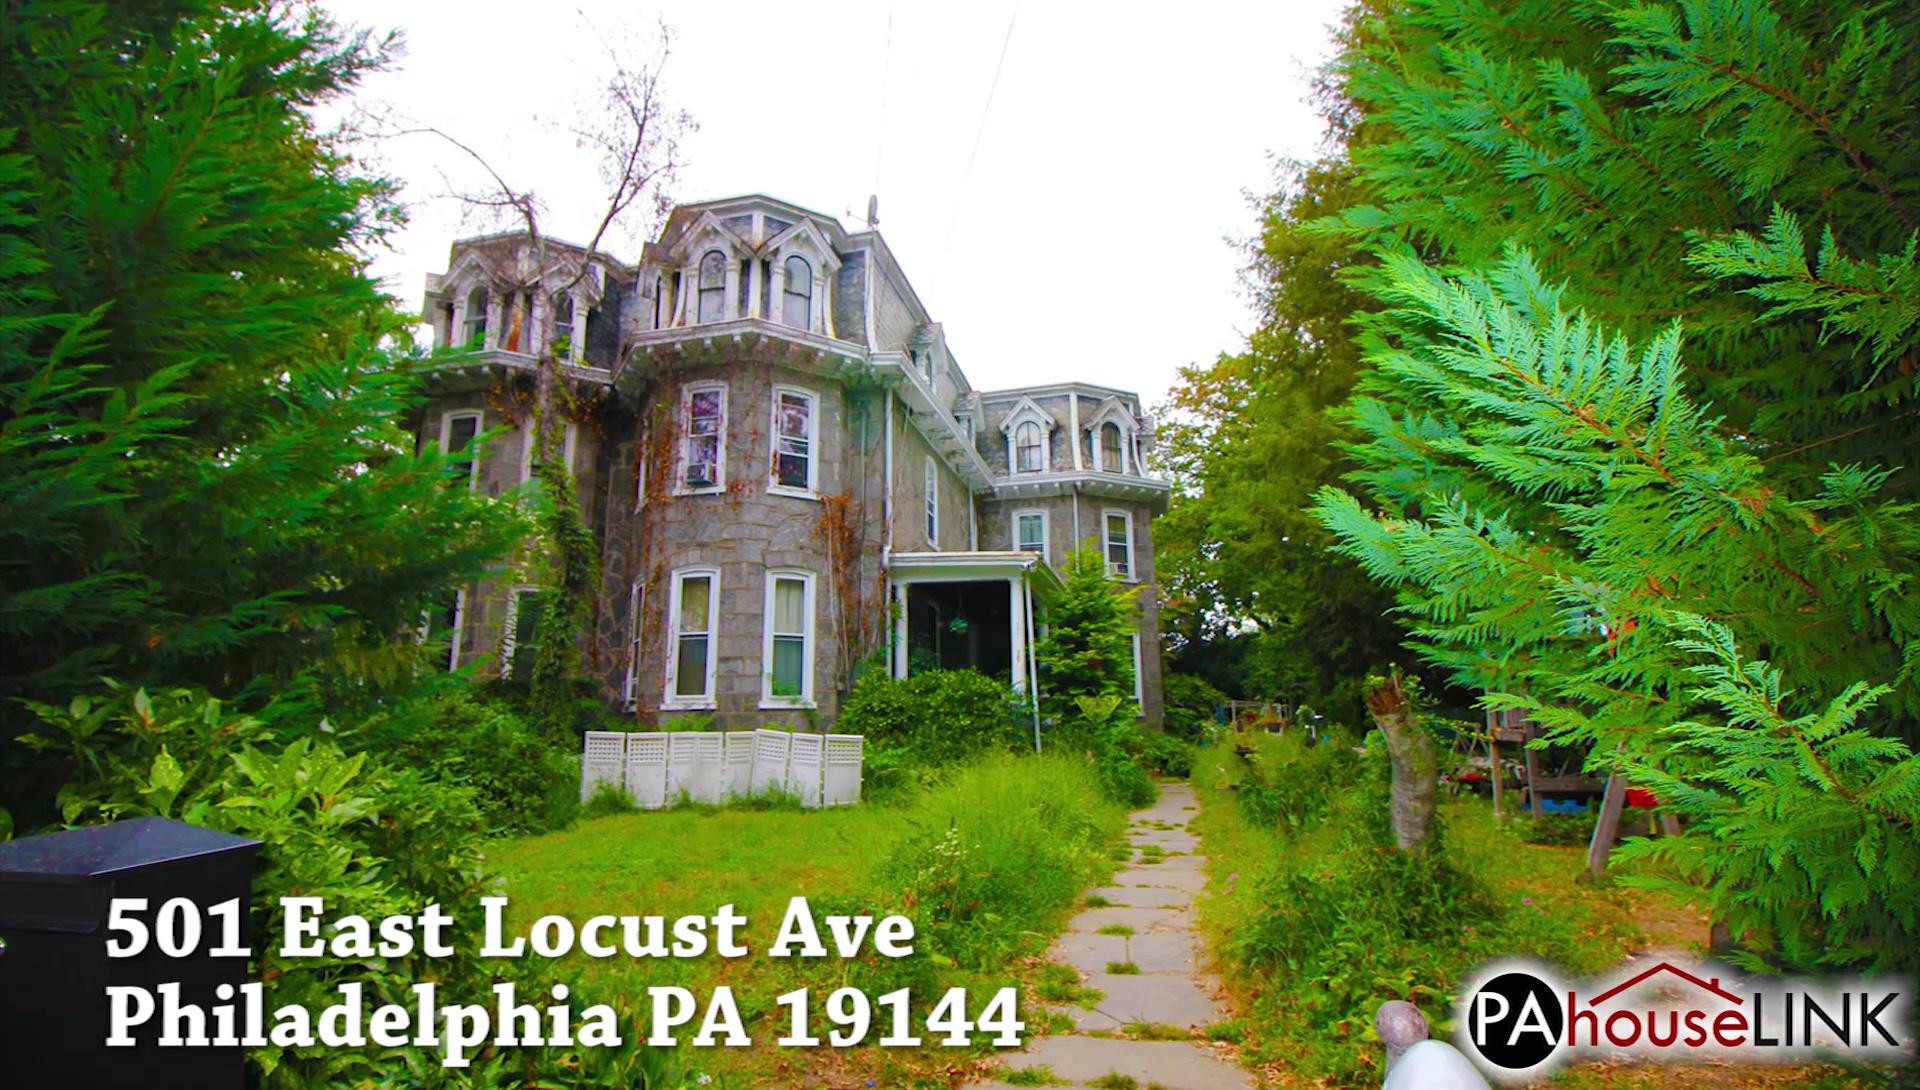 501 E Locust Ave Philadelphia PA 19144 | Coming Soon Foreclosure Properties Philadelphia PA 19144